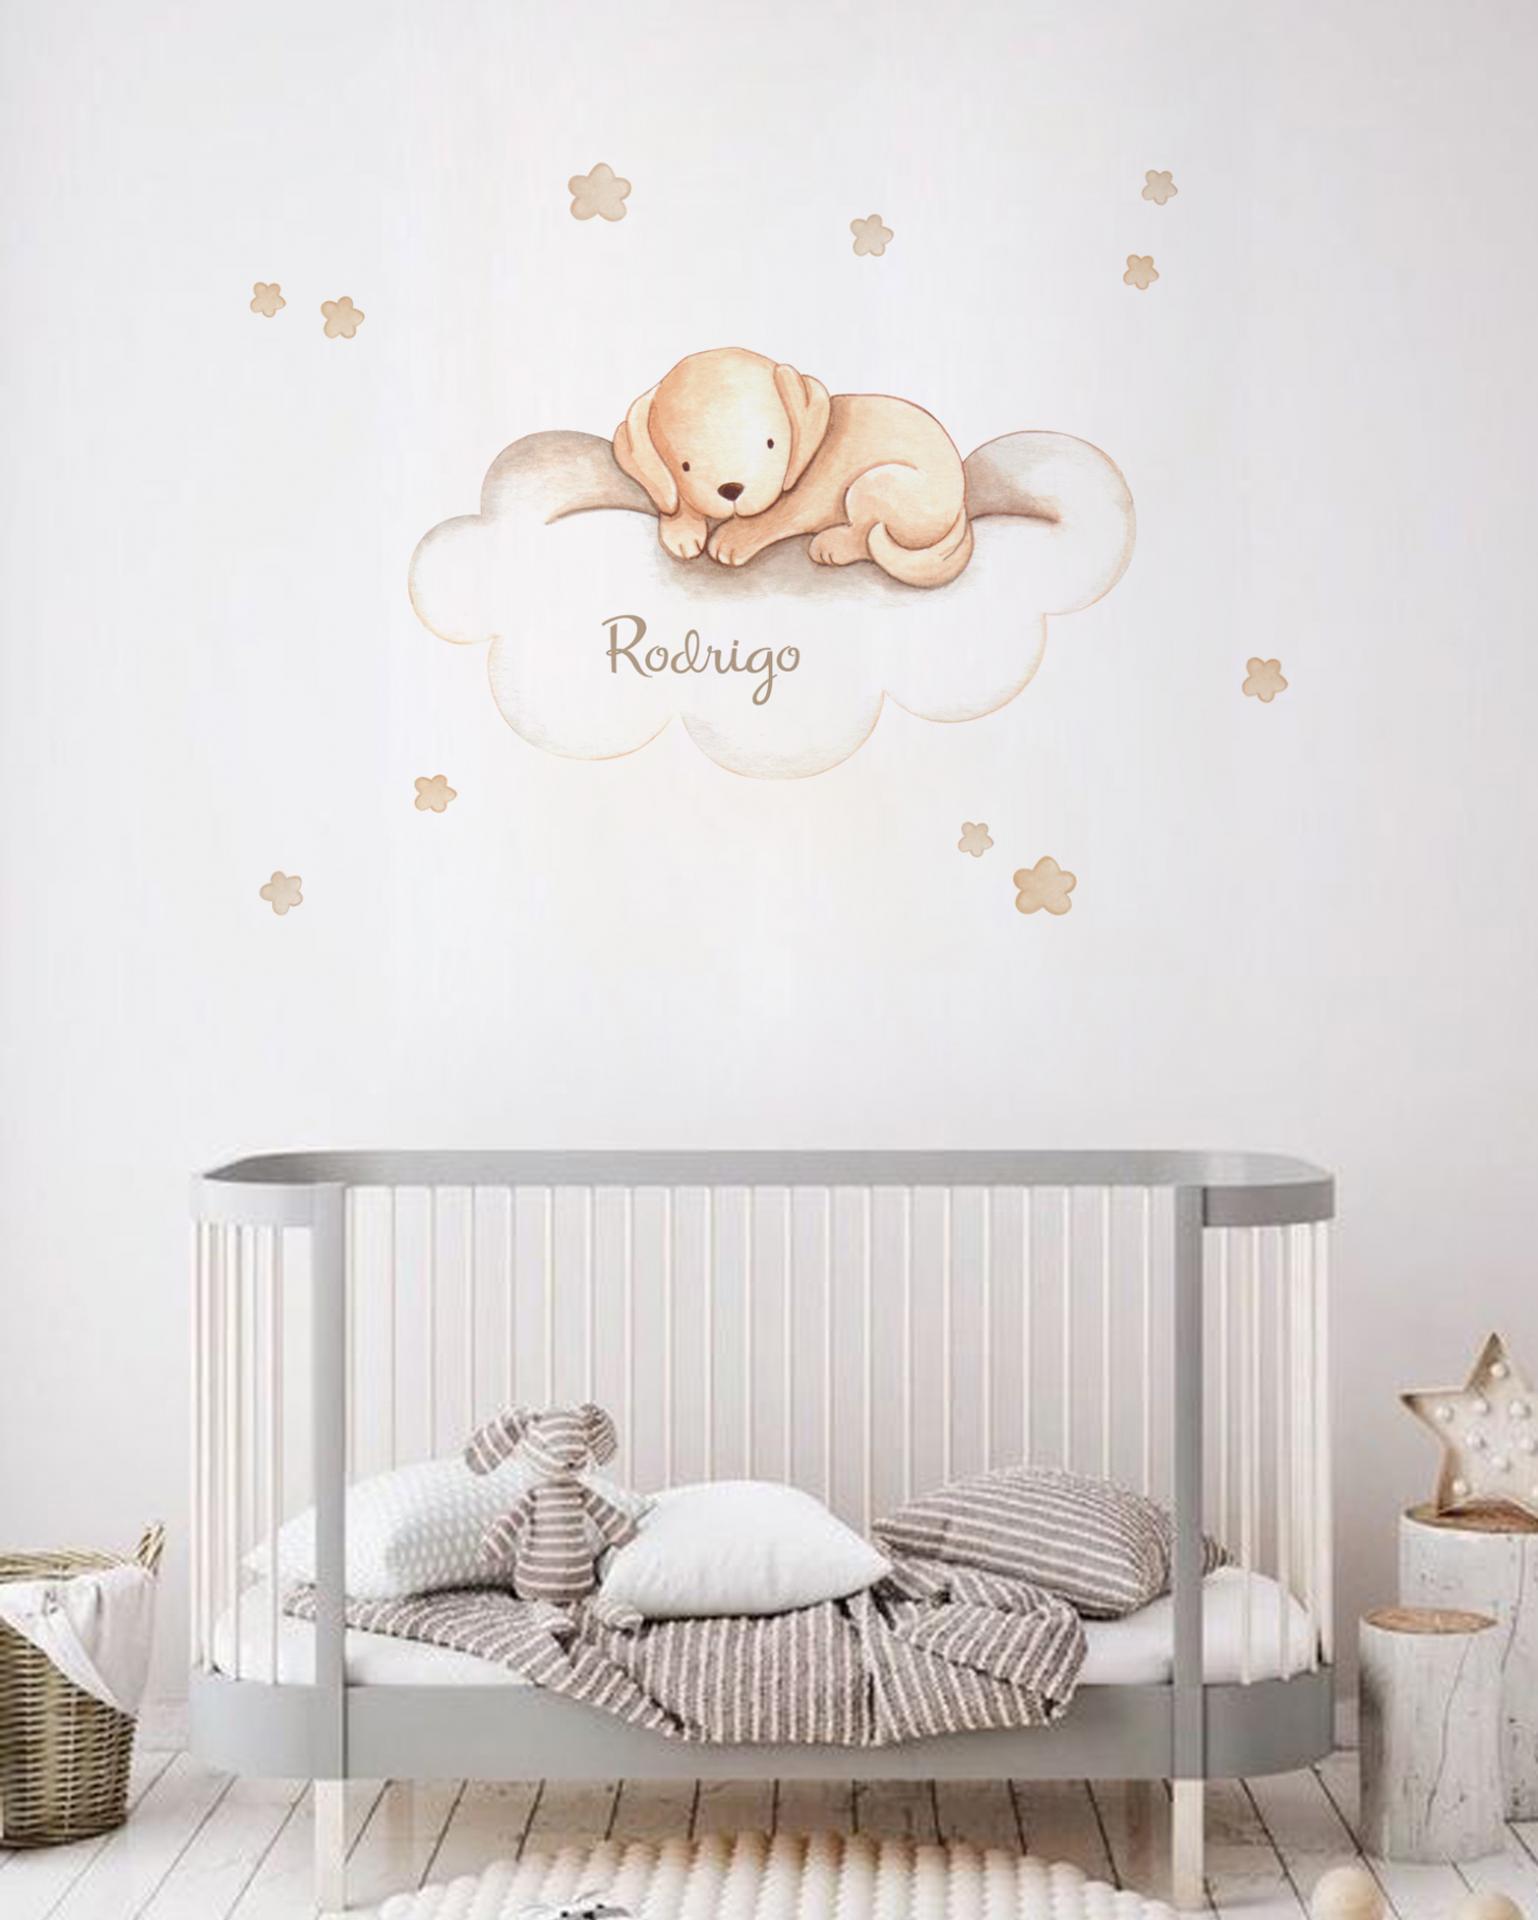 VINILO INFANTIL: Perrito marrón en nube